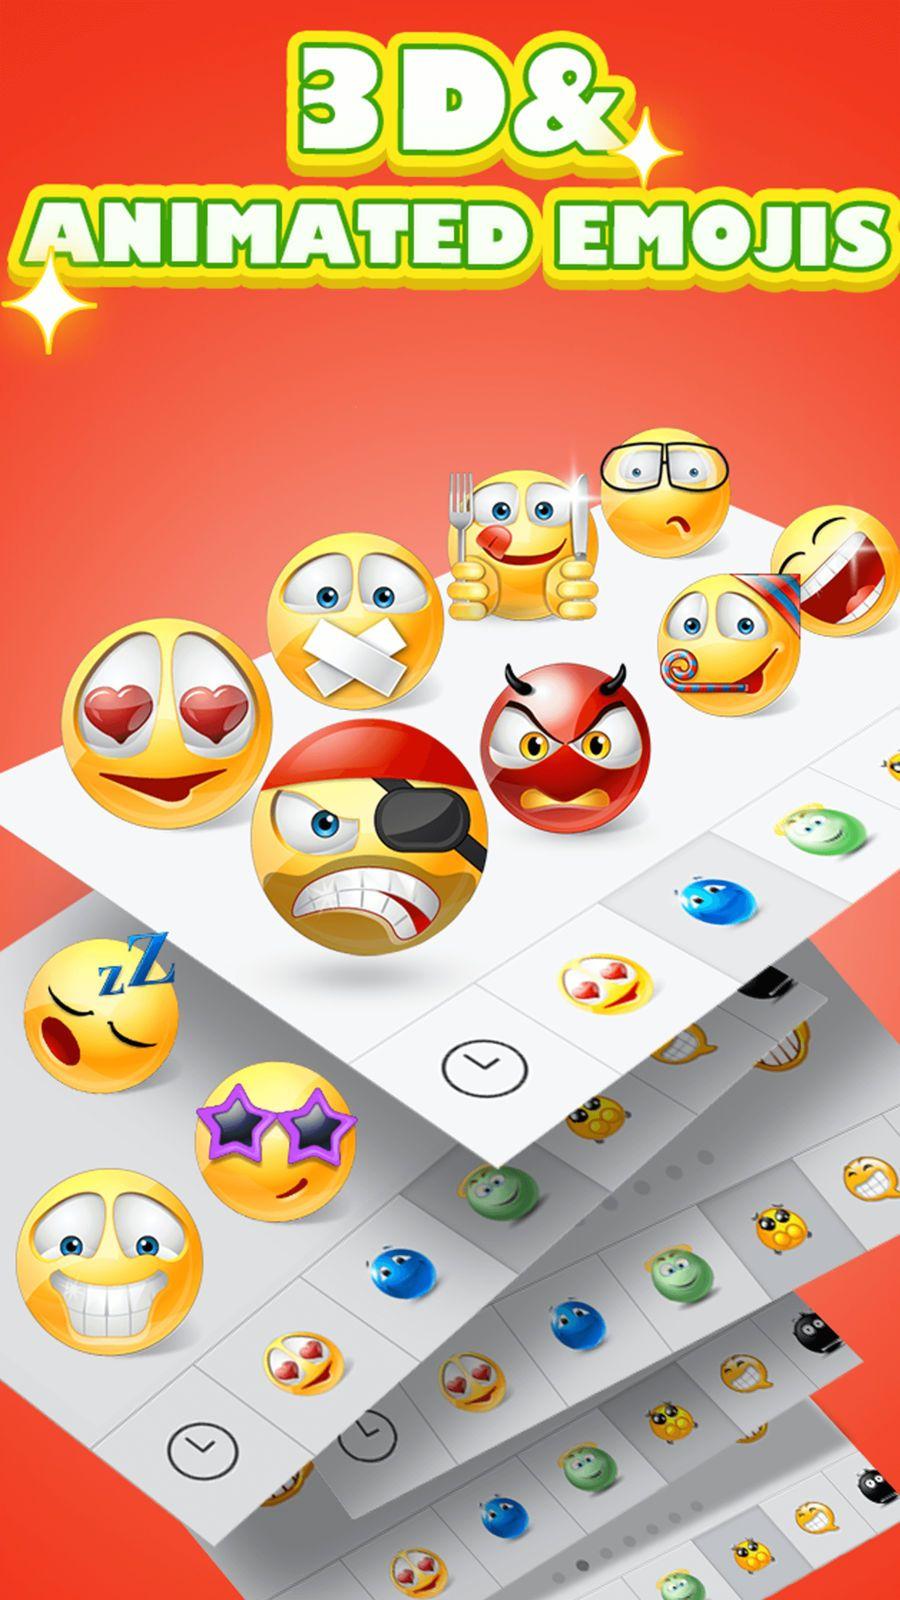 5000 Emoji NetworkingSocialappsios Animated emojis